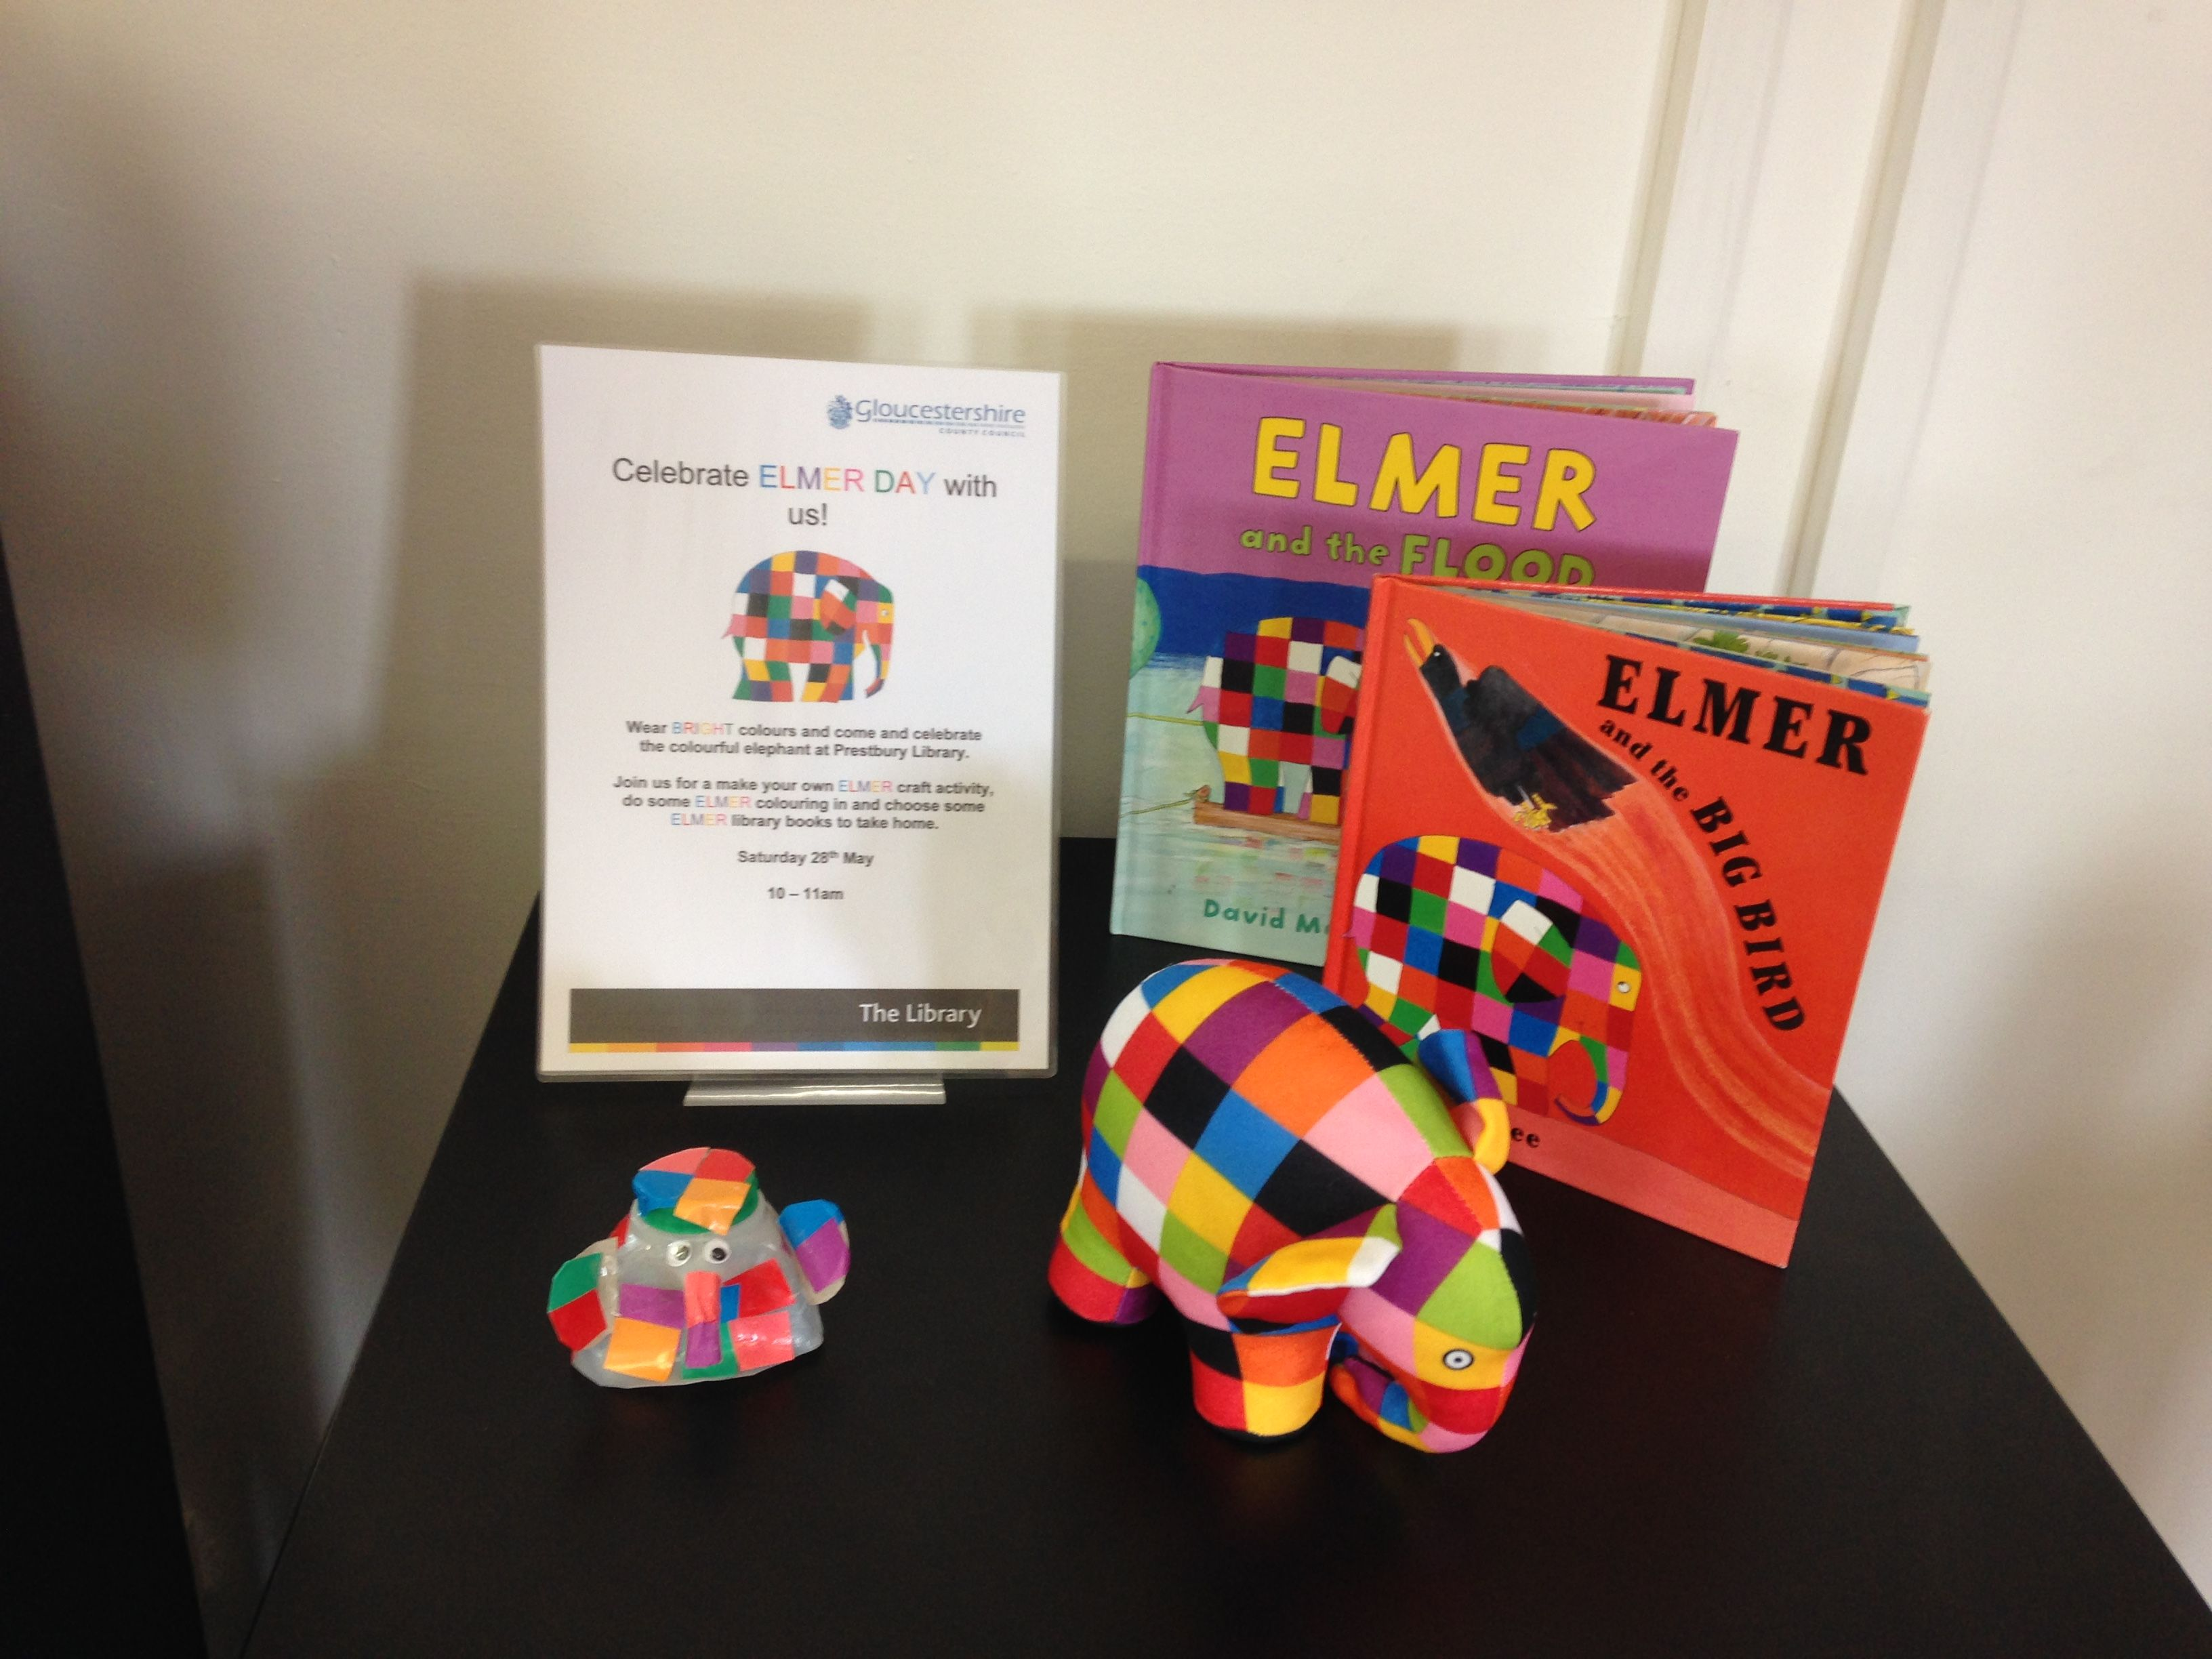 Prestbury library has an elmer event especially for elmer